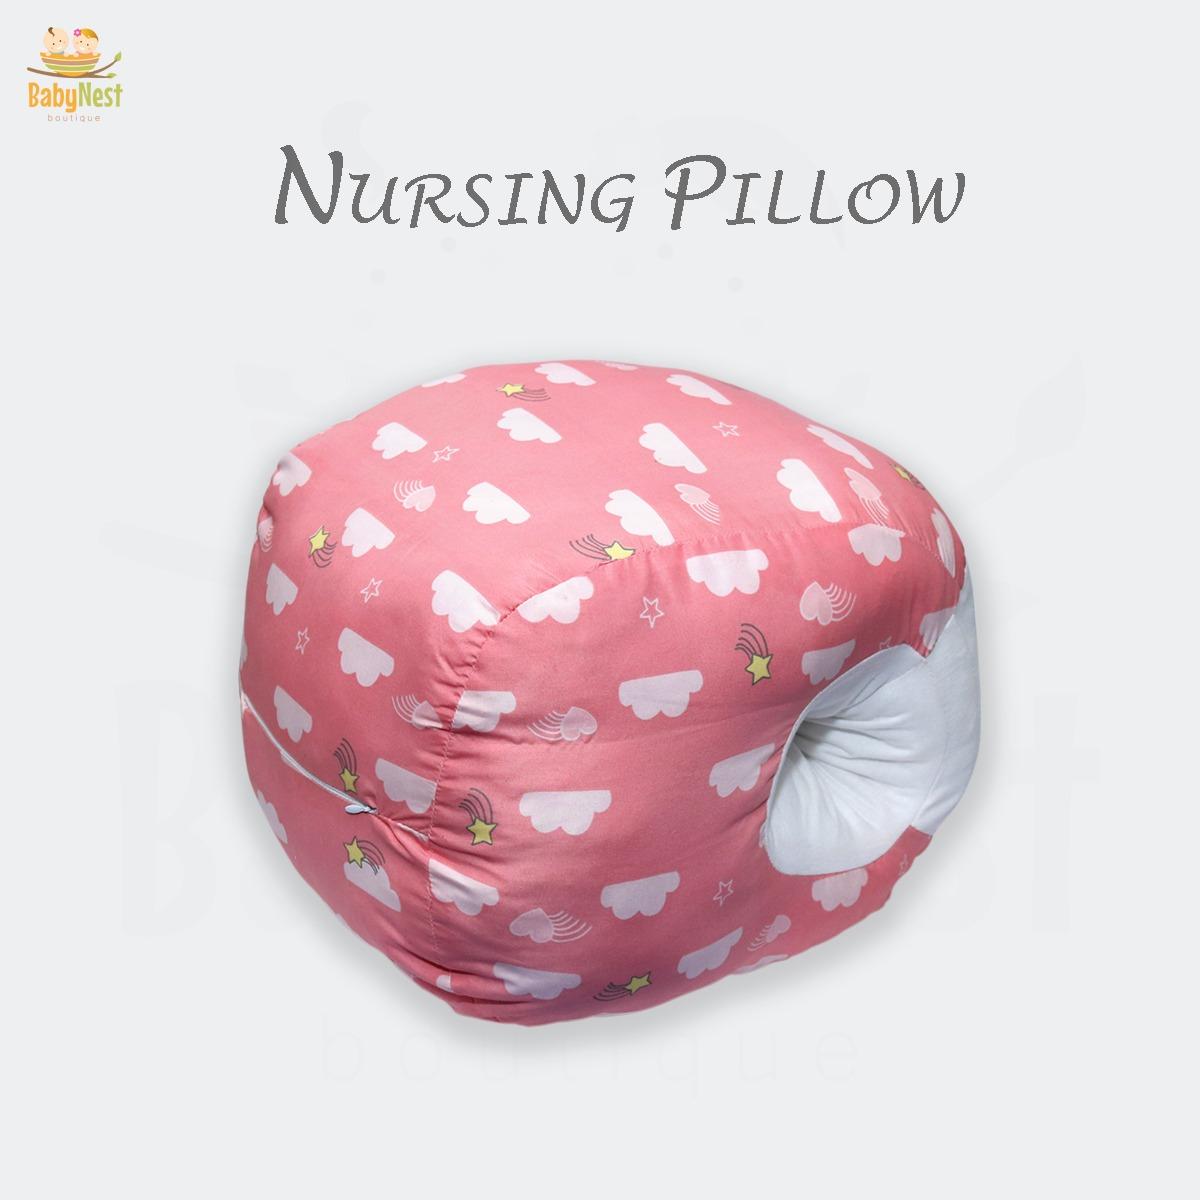 bnnp 54 4 in 1 nursing pillow